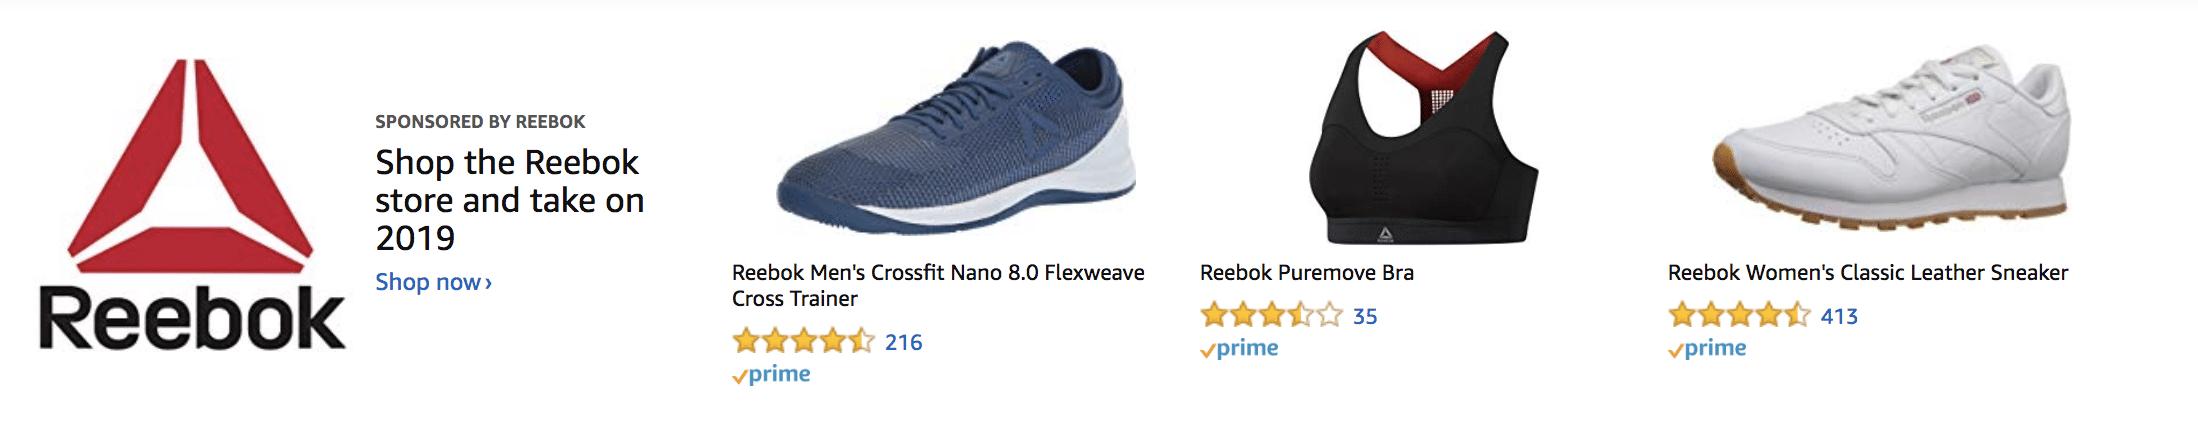 Sponsored Brands ads